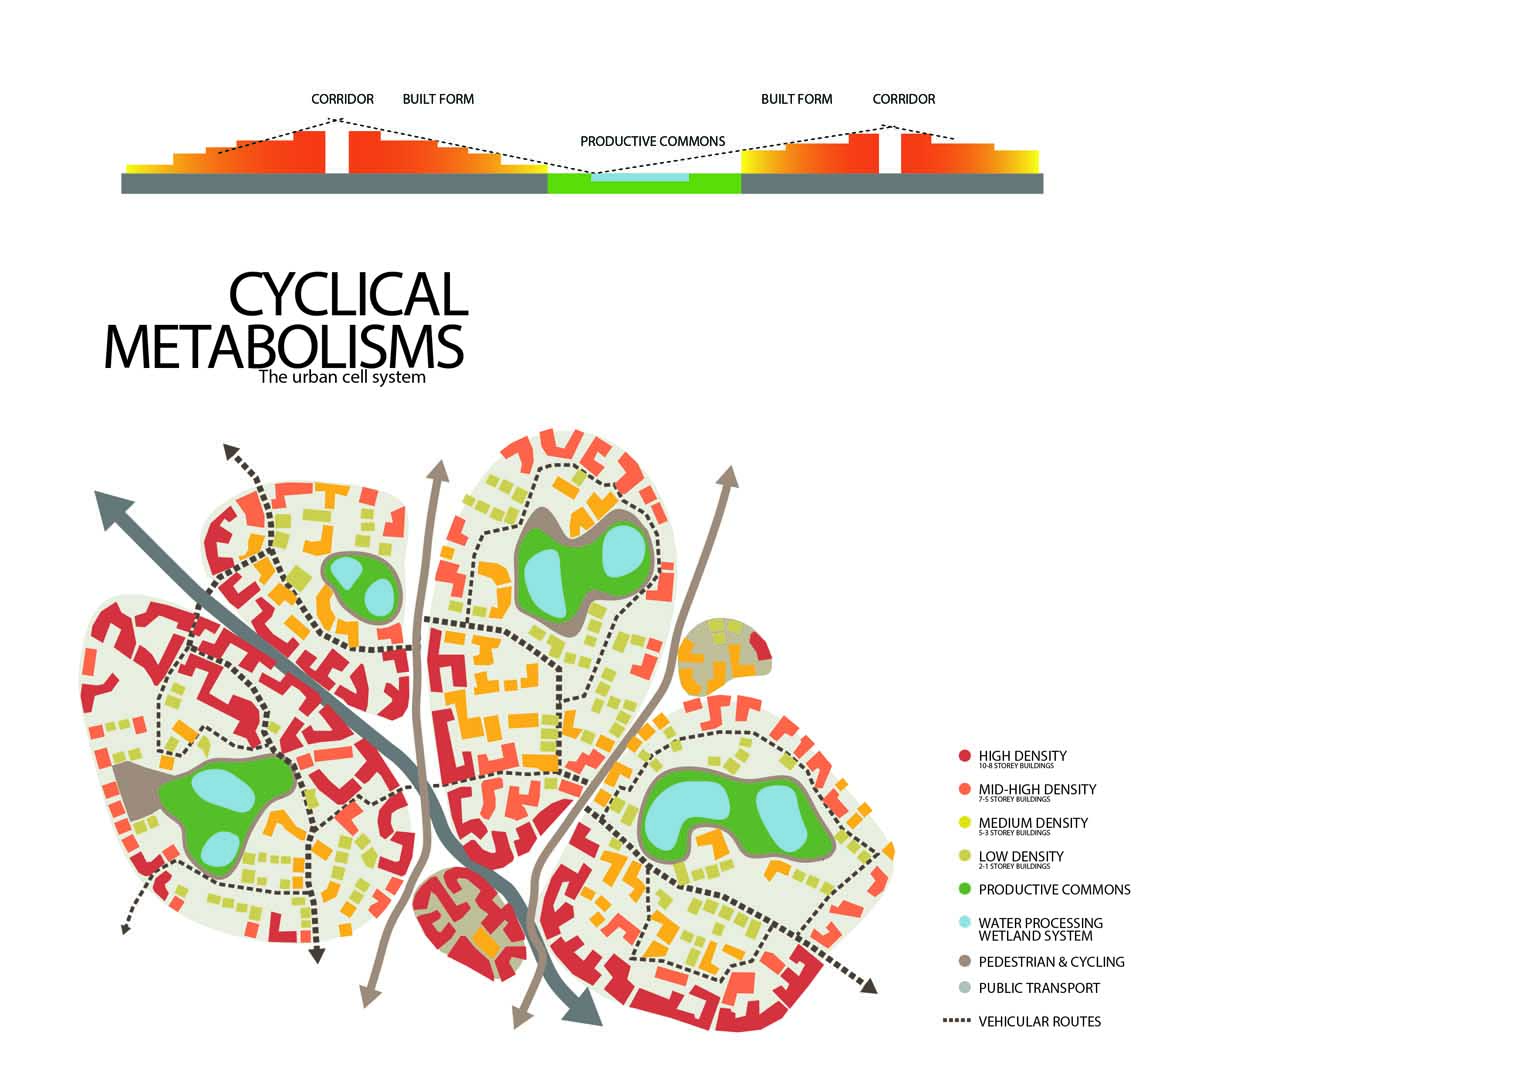 Smart-city-diagrams_cyclical-metabolism-02-1